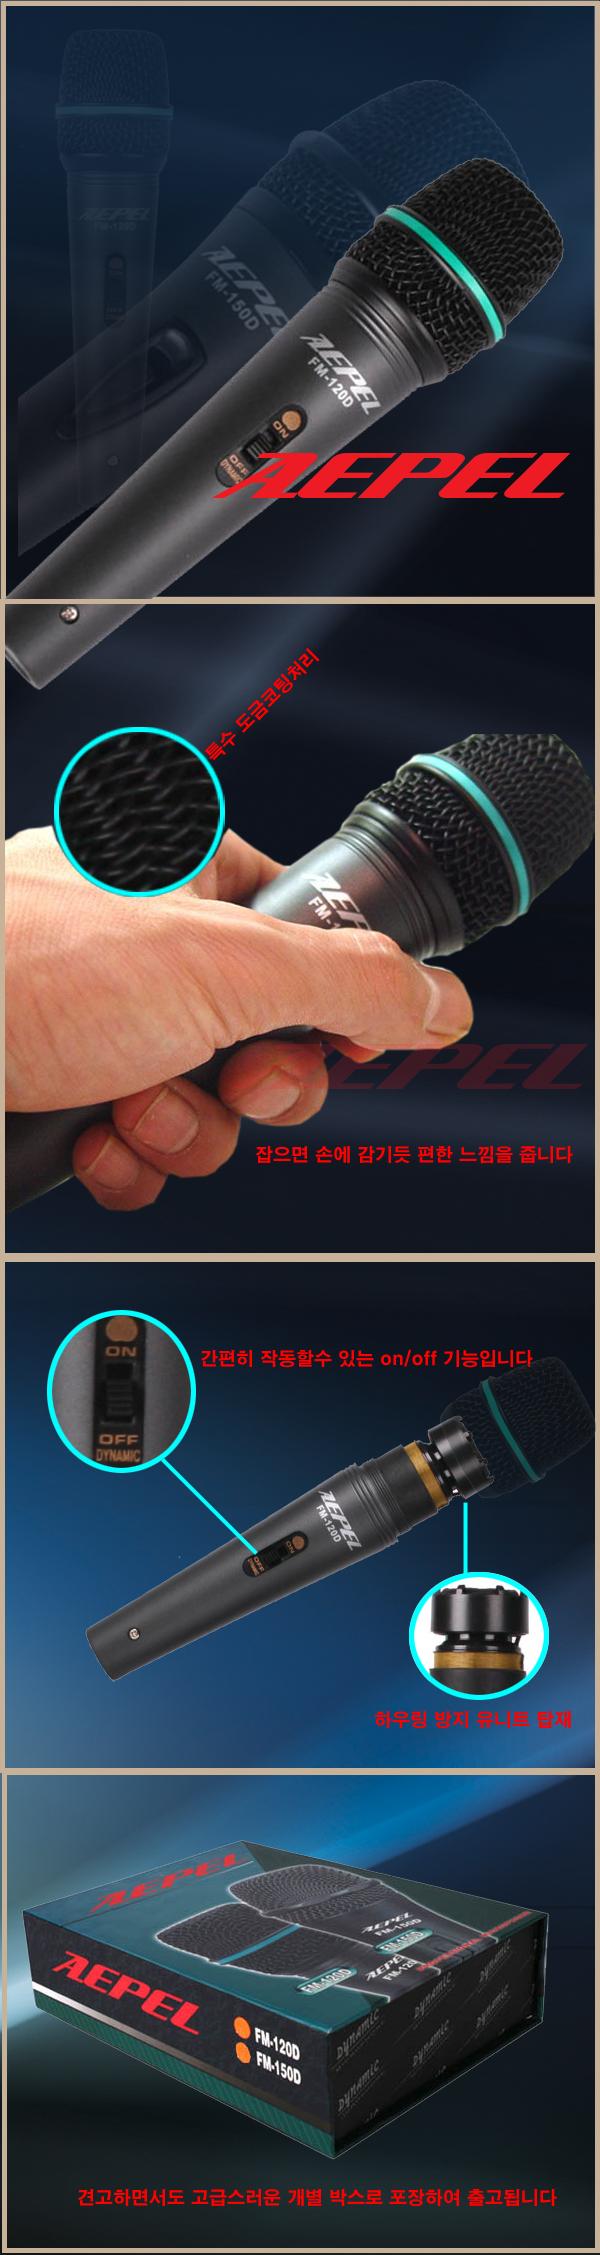 mic-karaoke-khong-day-fm120d-aepel-han-quoc